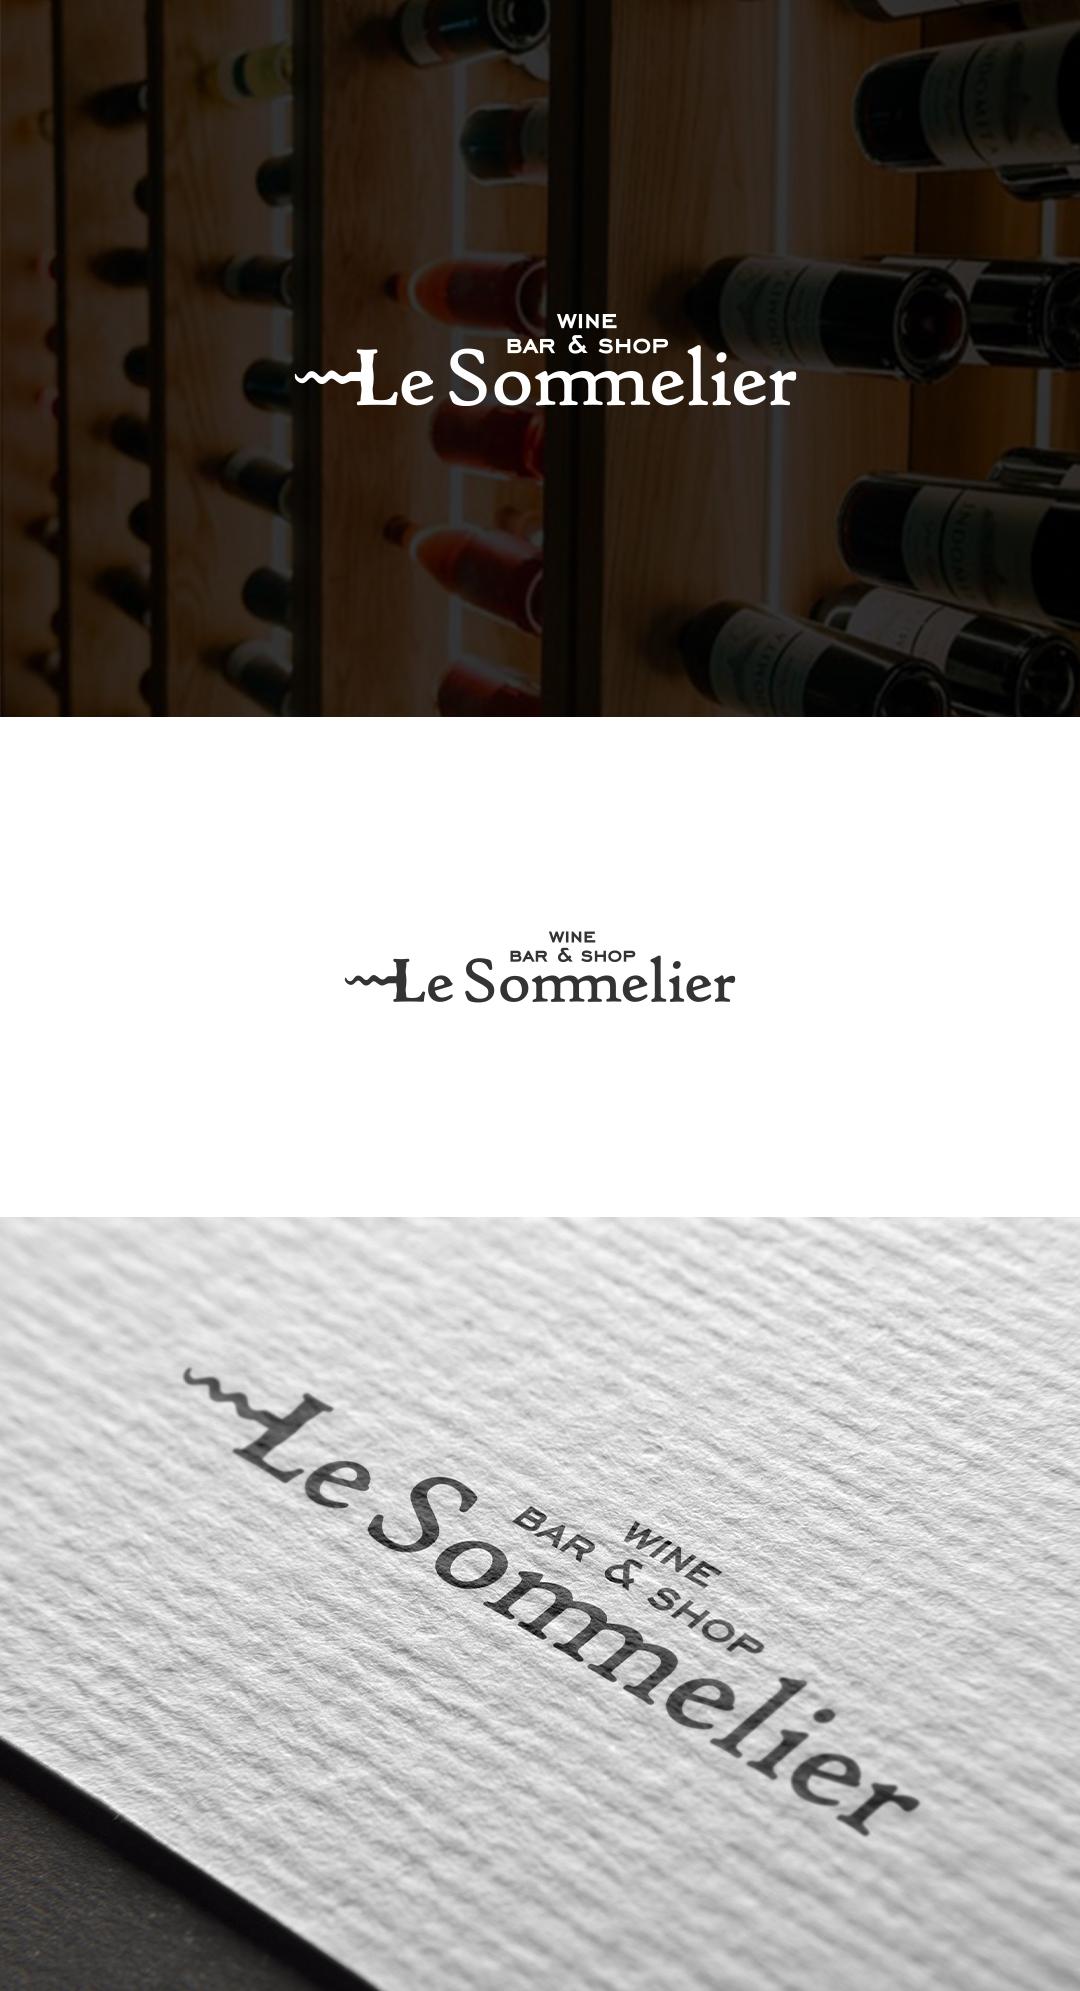 Le Sommelier винный бар